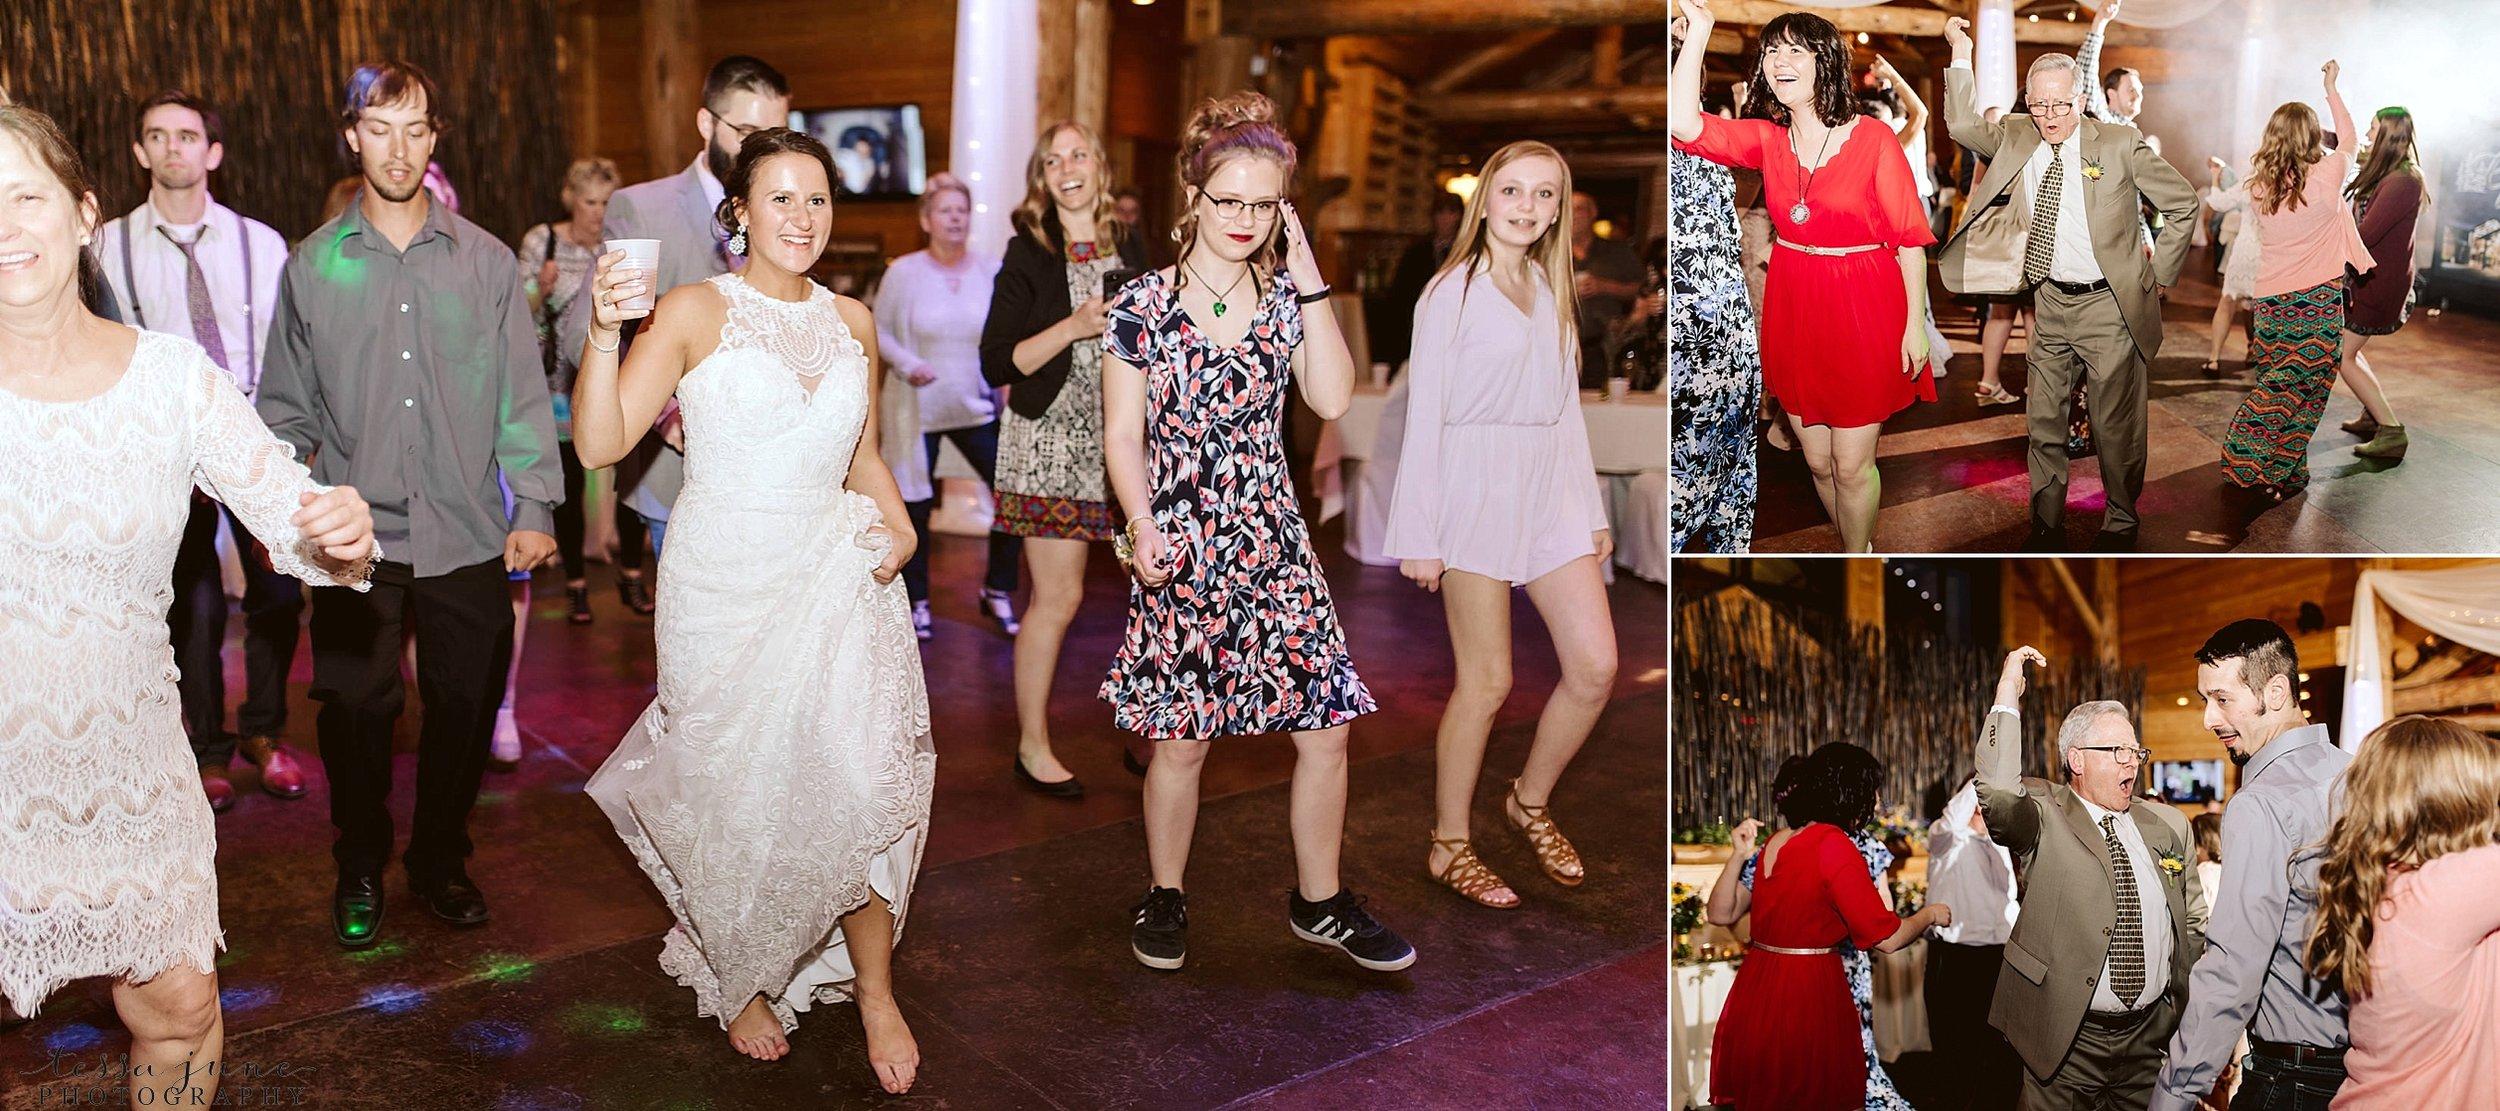 The-grands-at-mulligans-wedding-sartell-minnesota-spring-floral-spring-garden-wedding-162.jpg